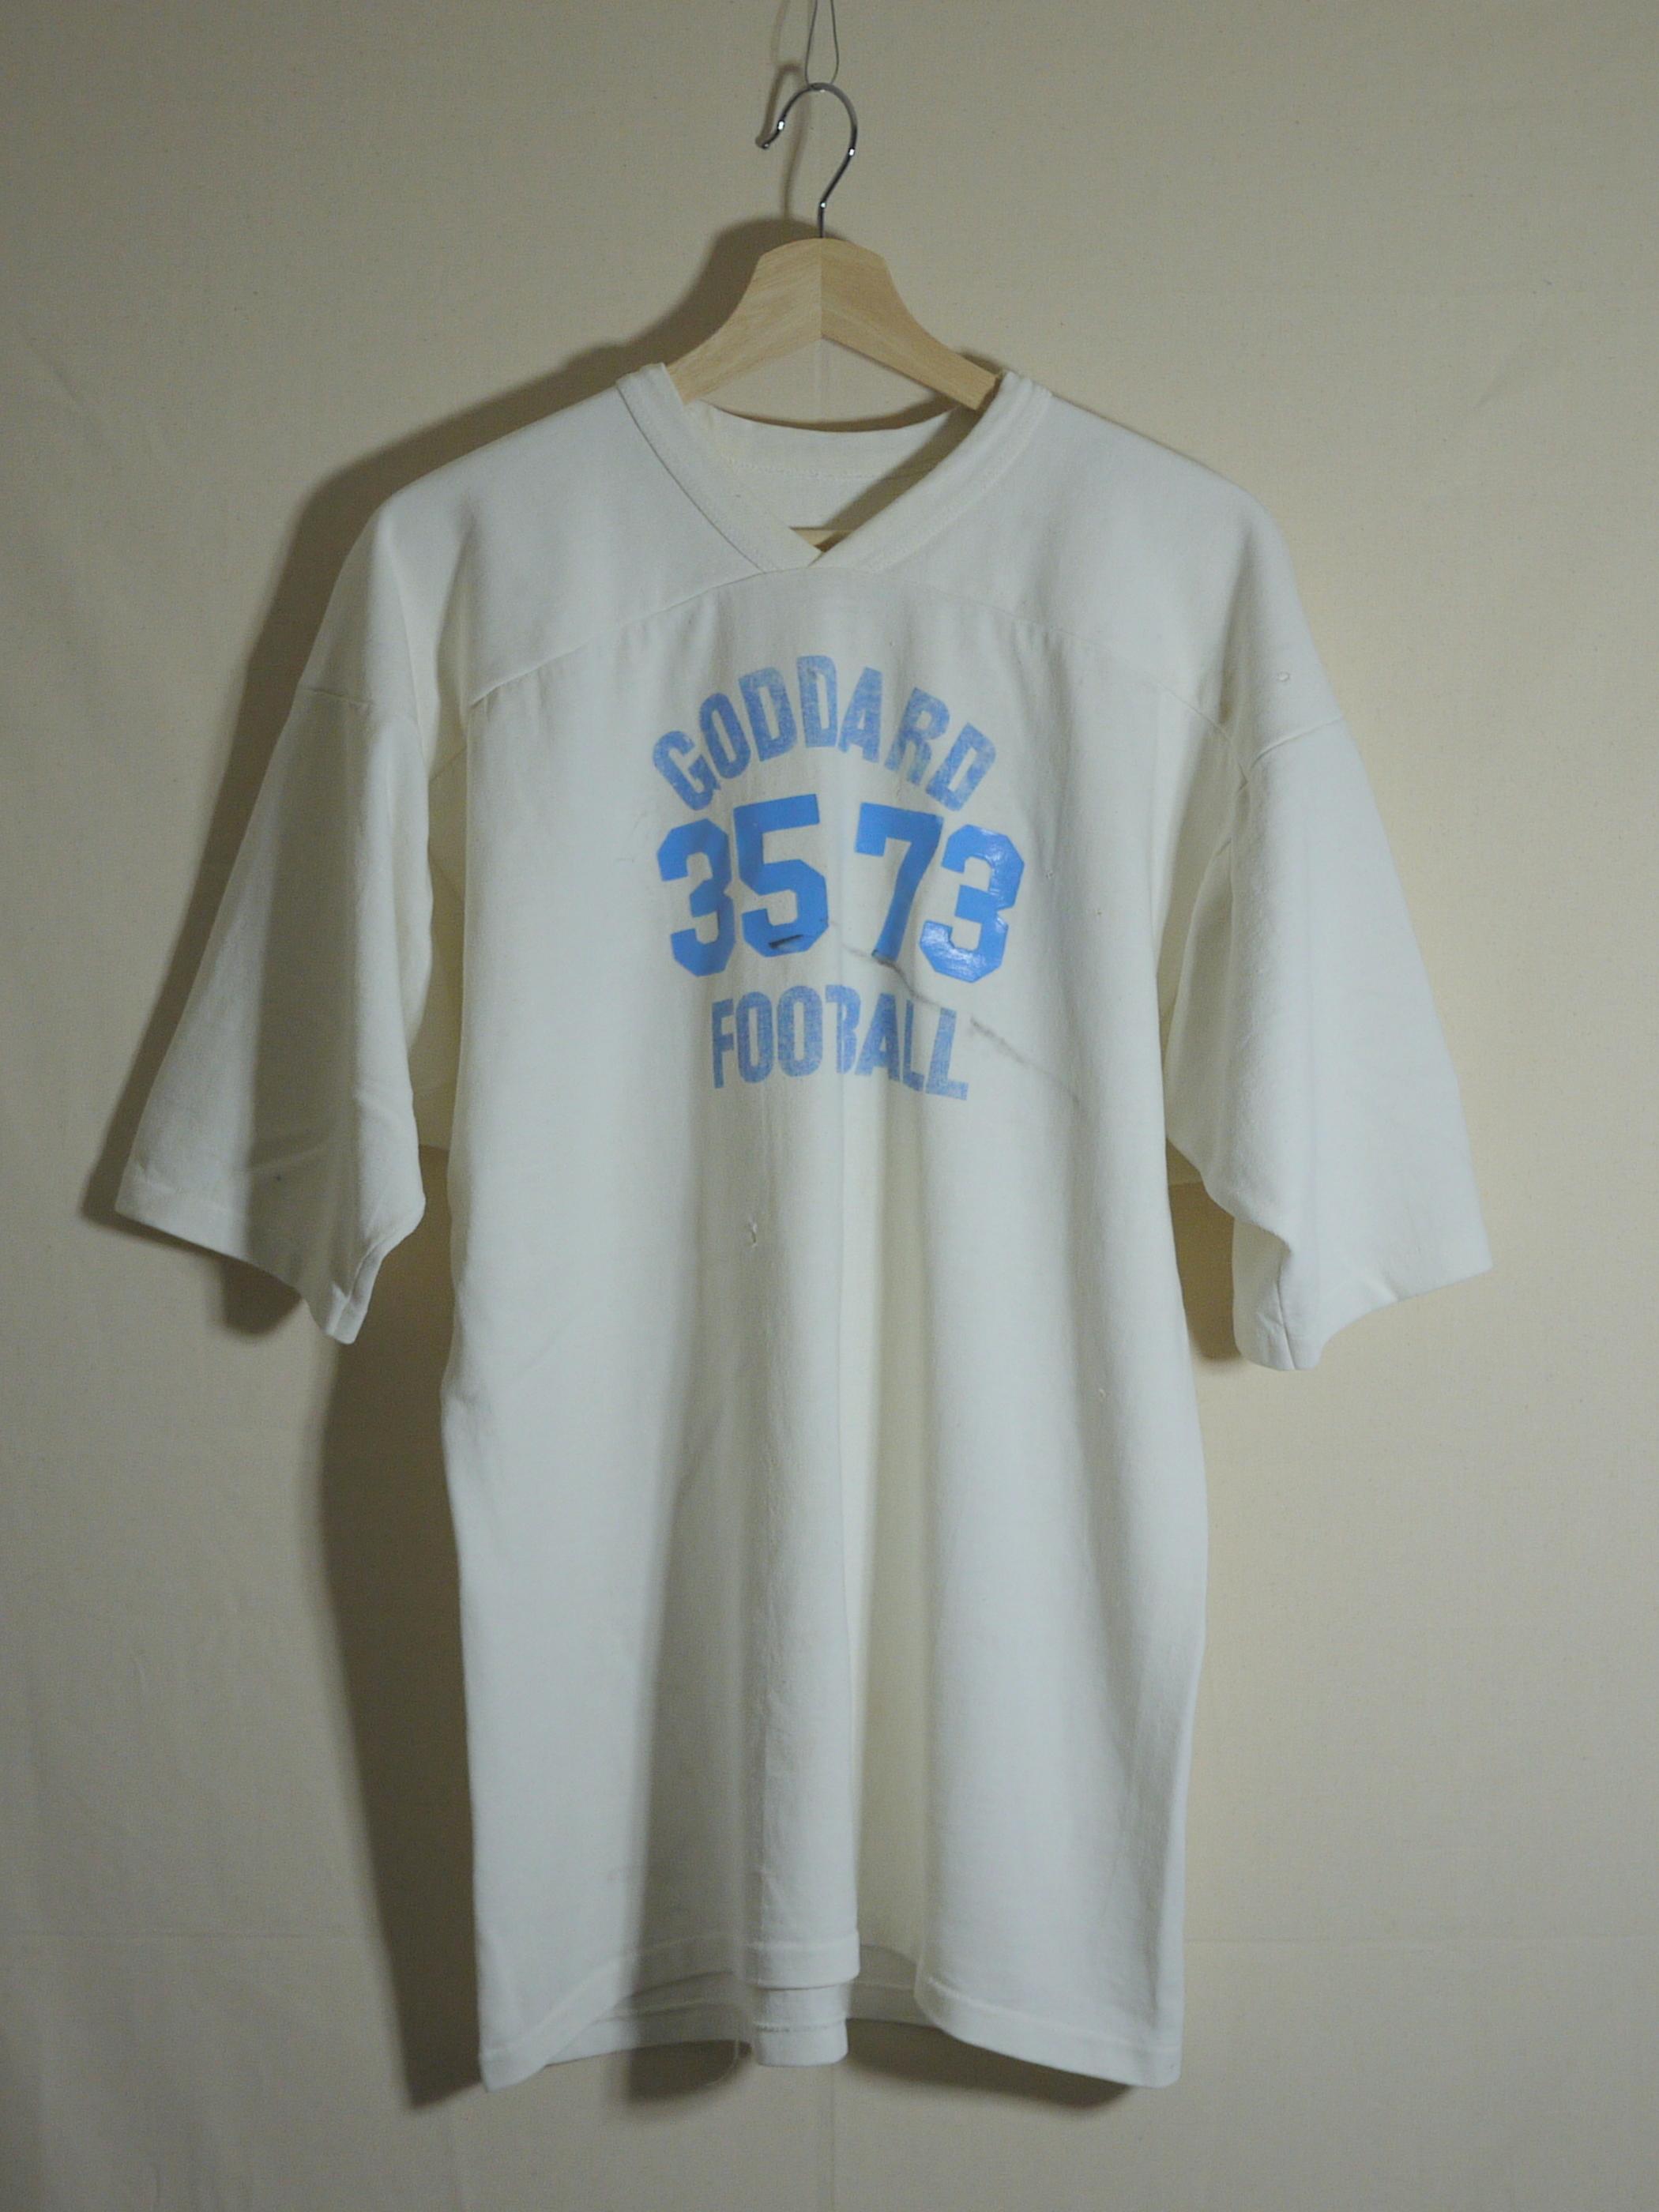 Football T-Shirts #5